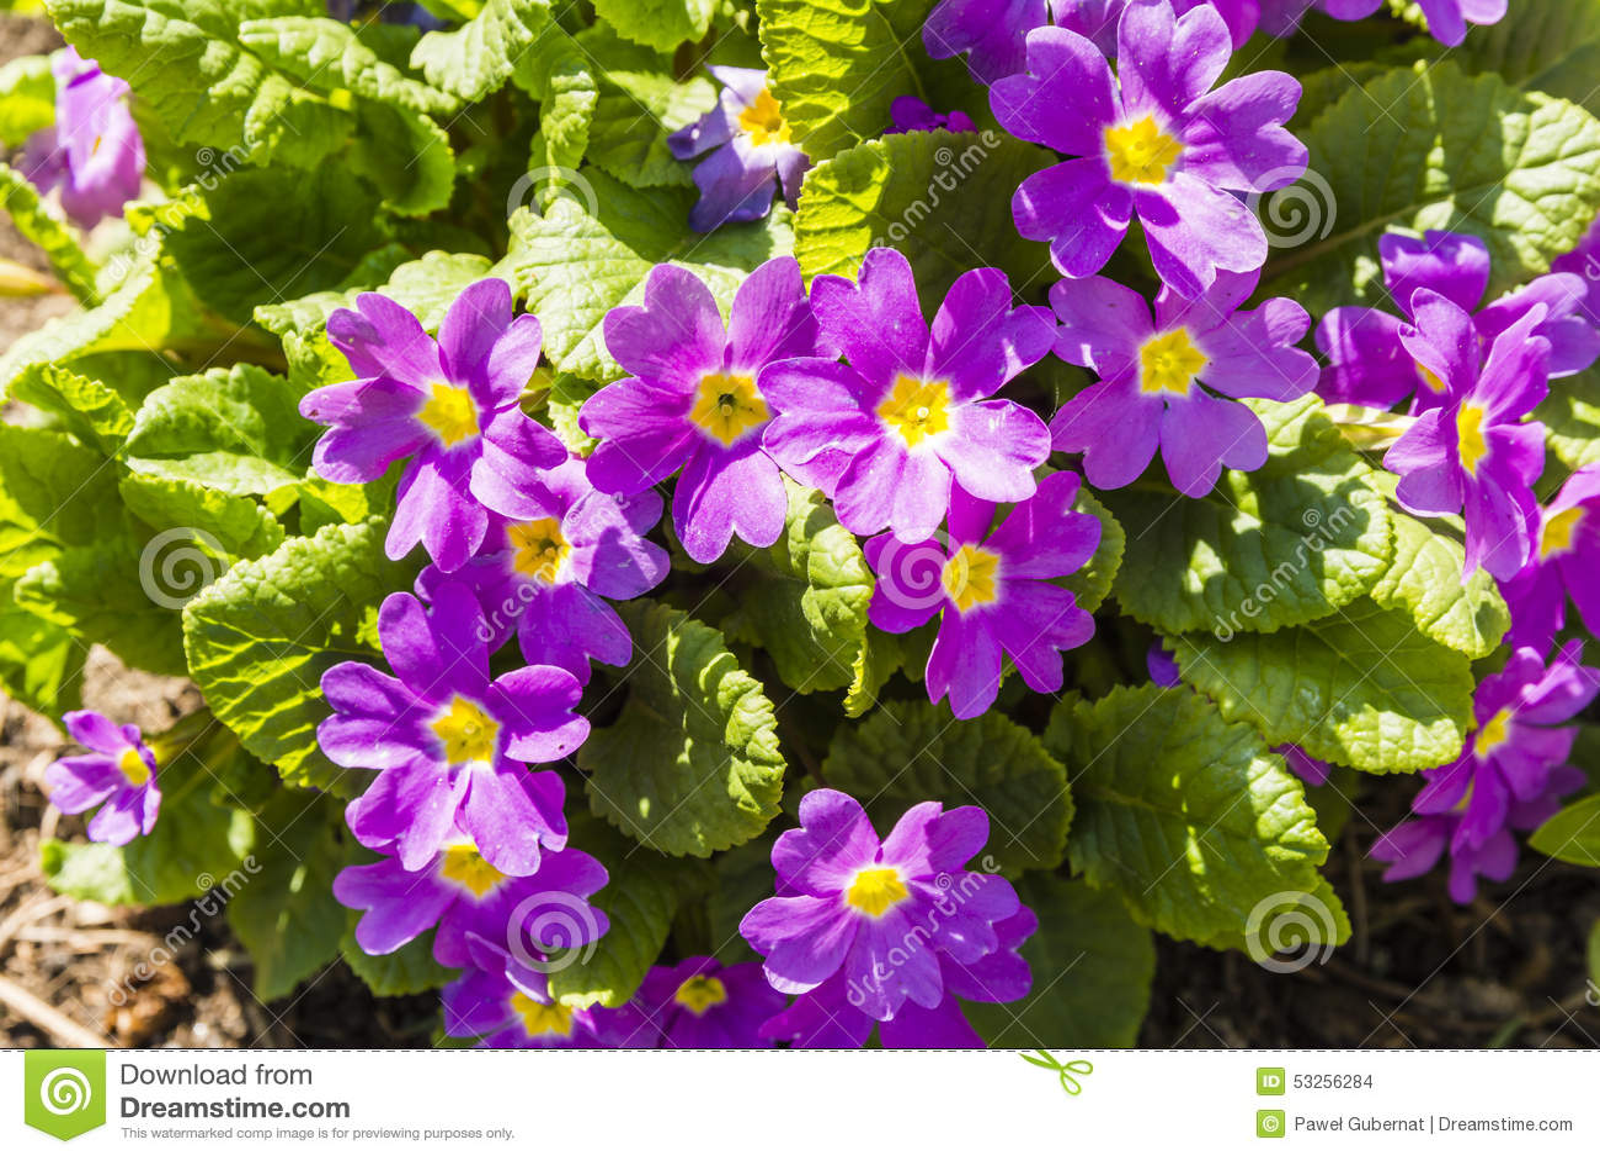 vari t d 39 levage de fleurs du genre primev re fleur rose photo stock image 53256284. Black Bedroom Furniture Sets. Home Design Ideas